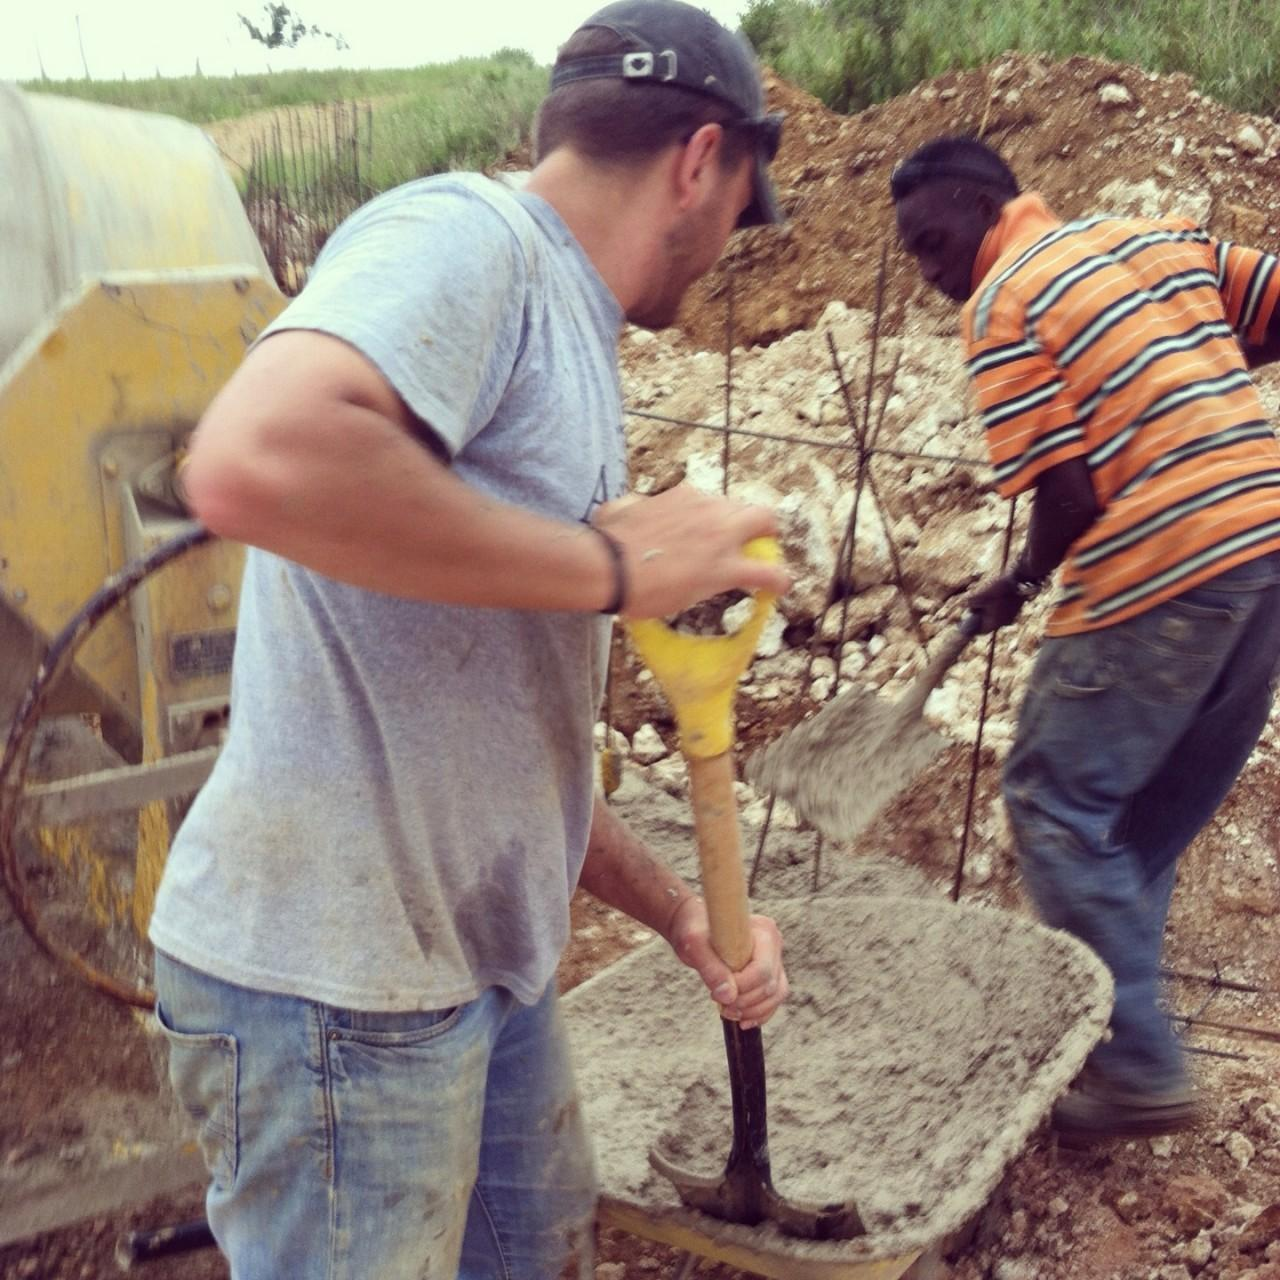 Two men shoveling cement.